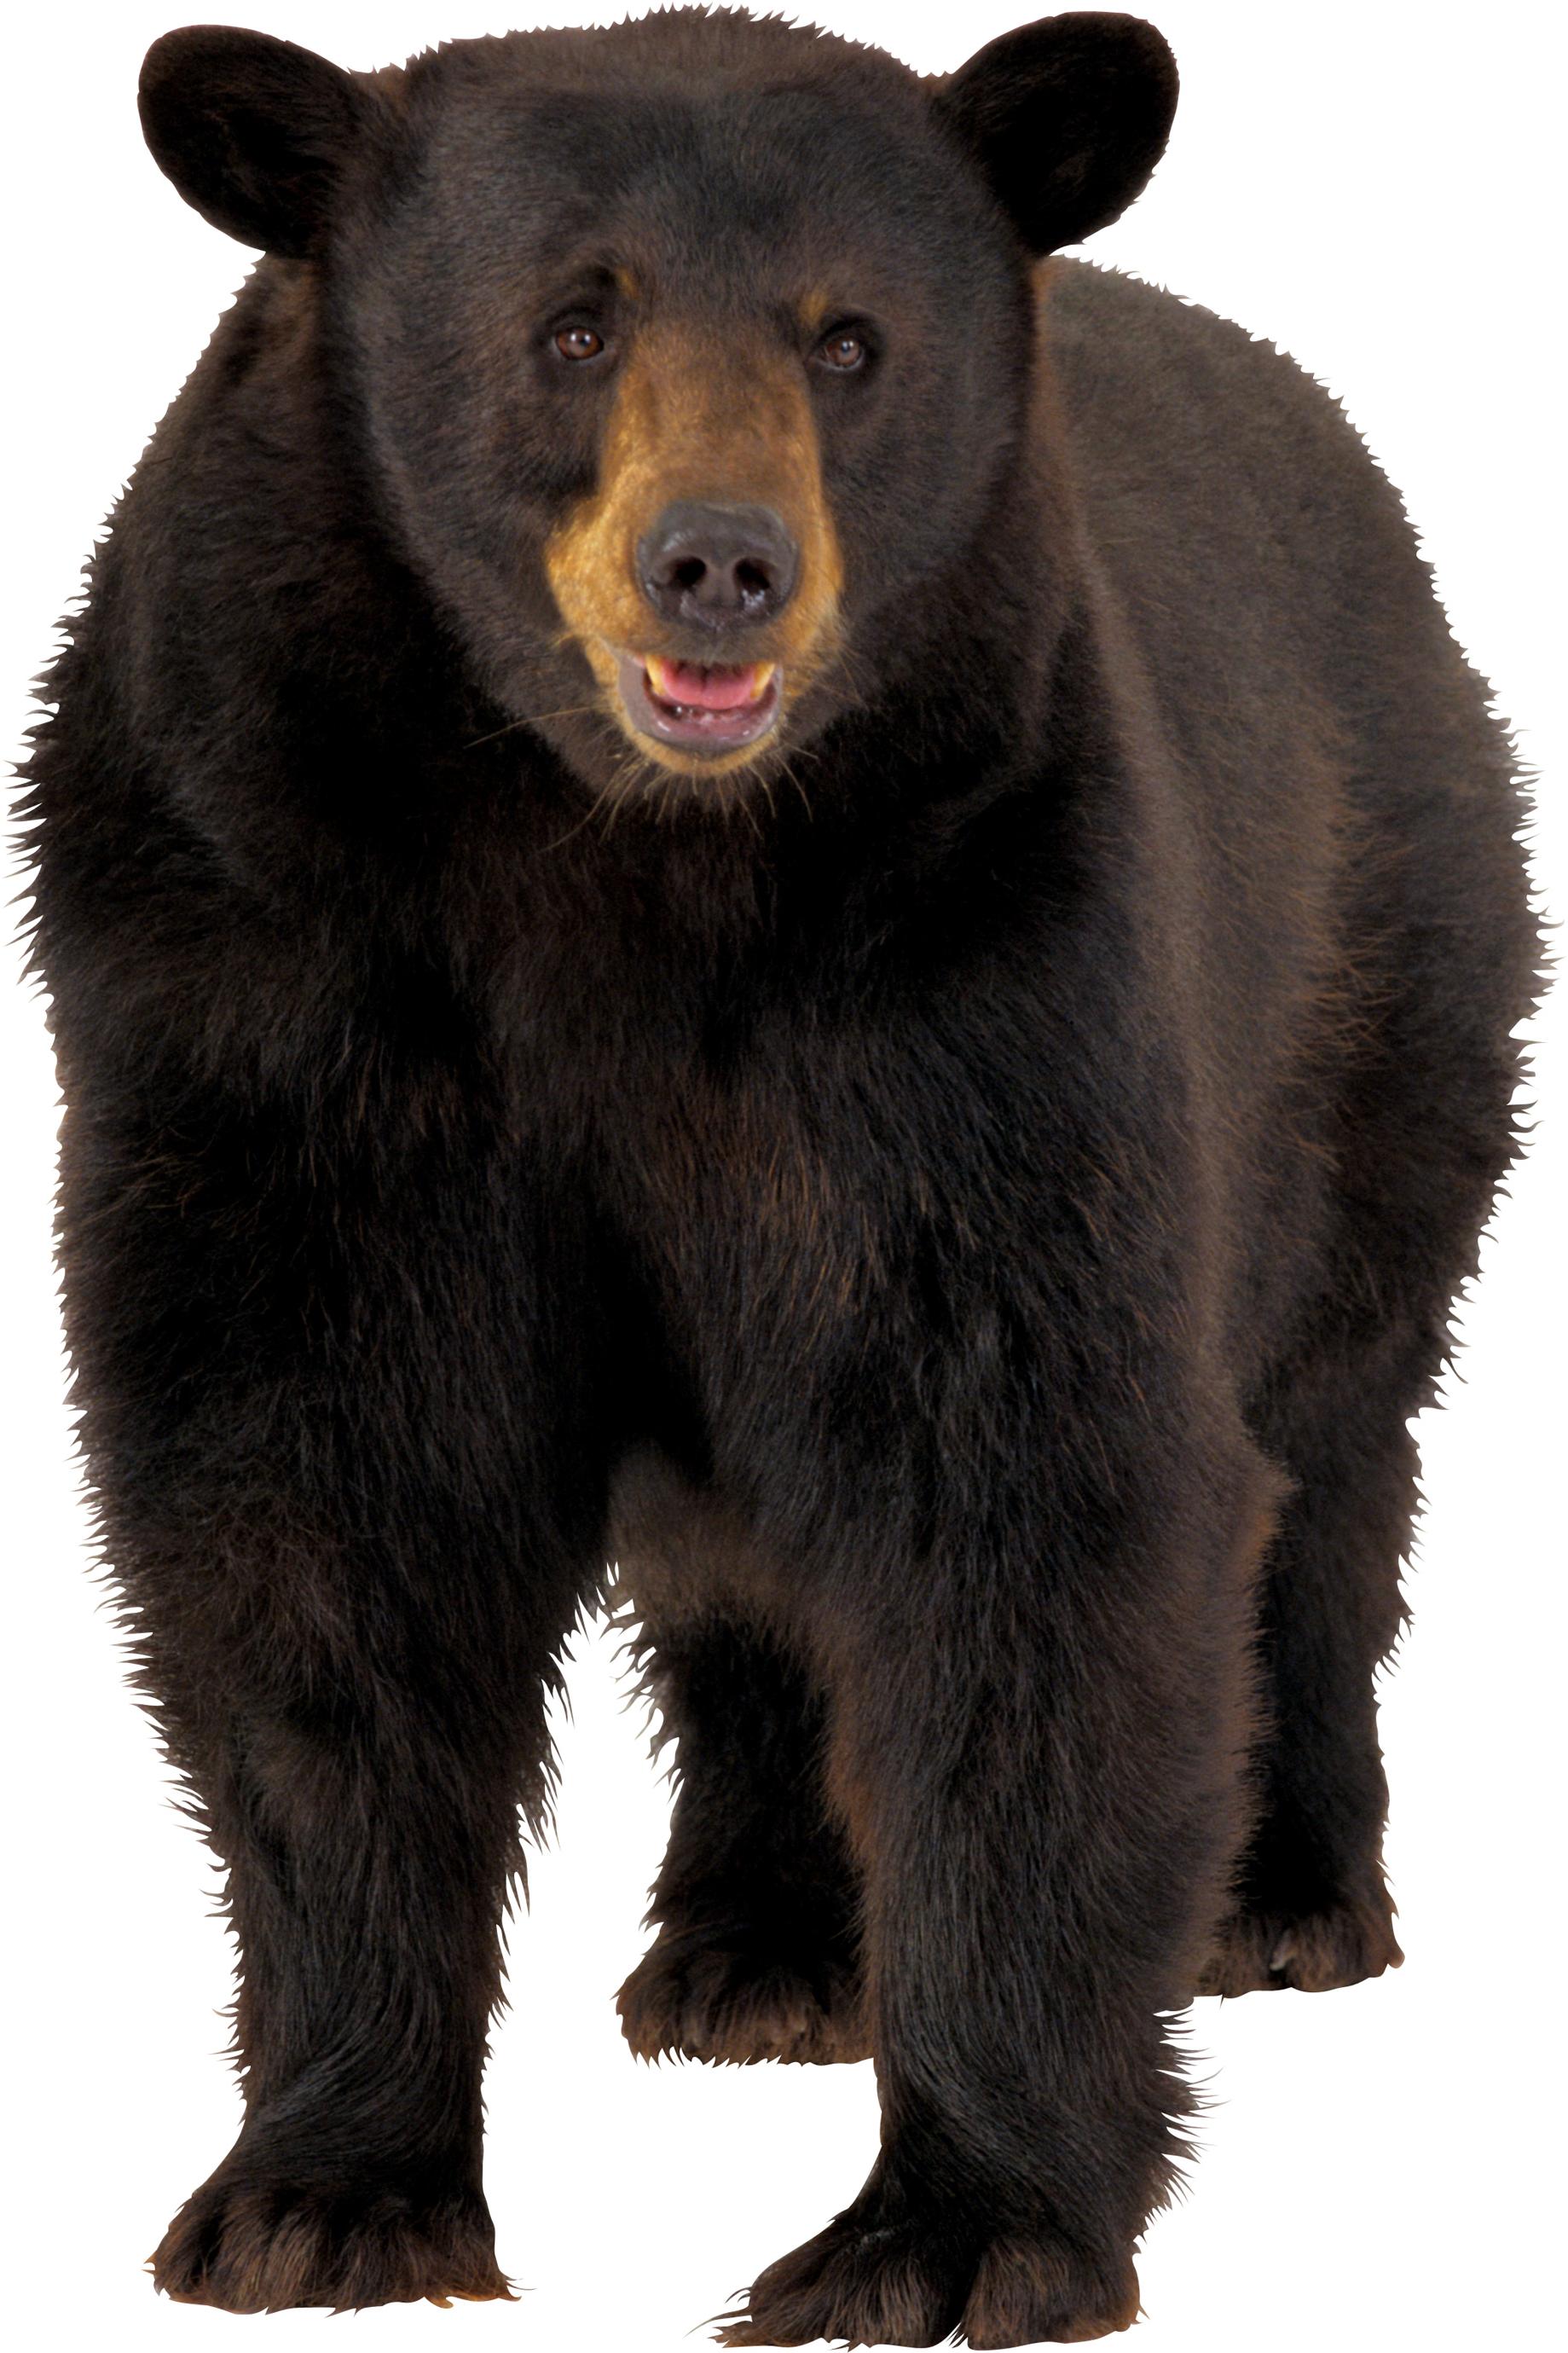 Download Png Image Brown Bear Png Image Animal Posters Bear Animal Cutouts